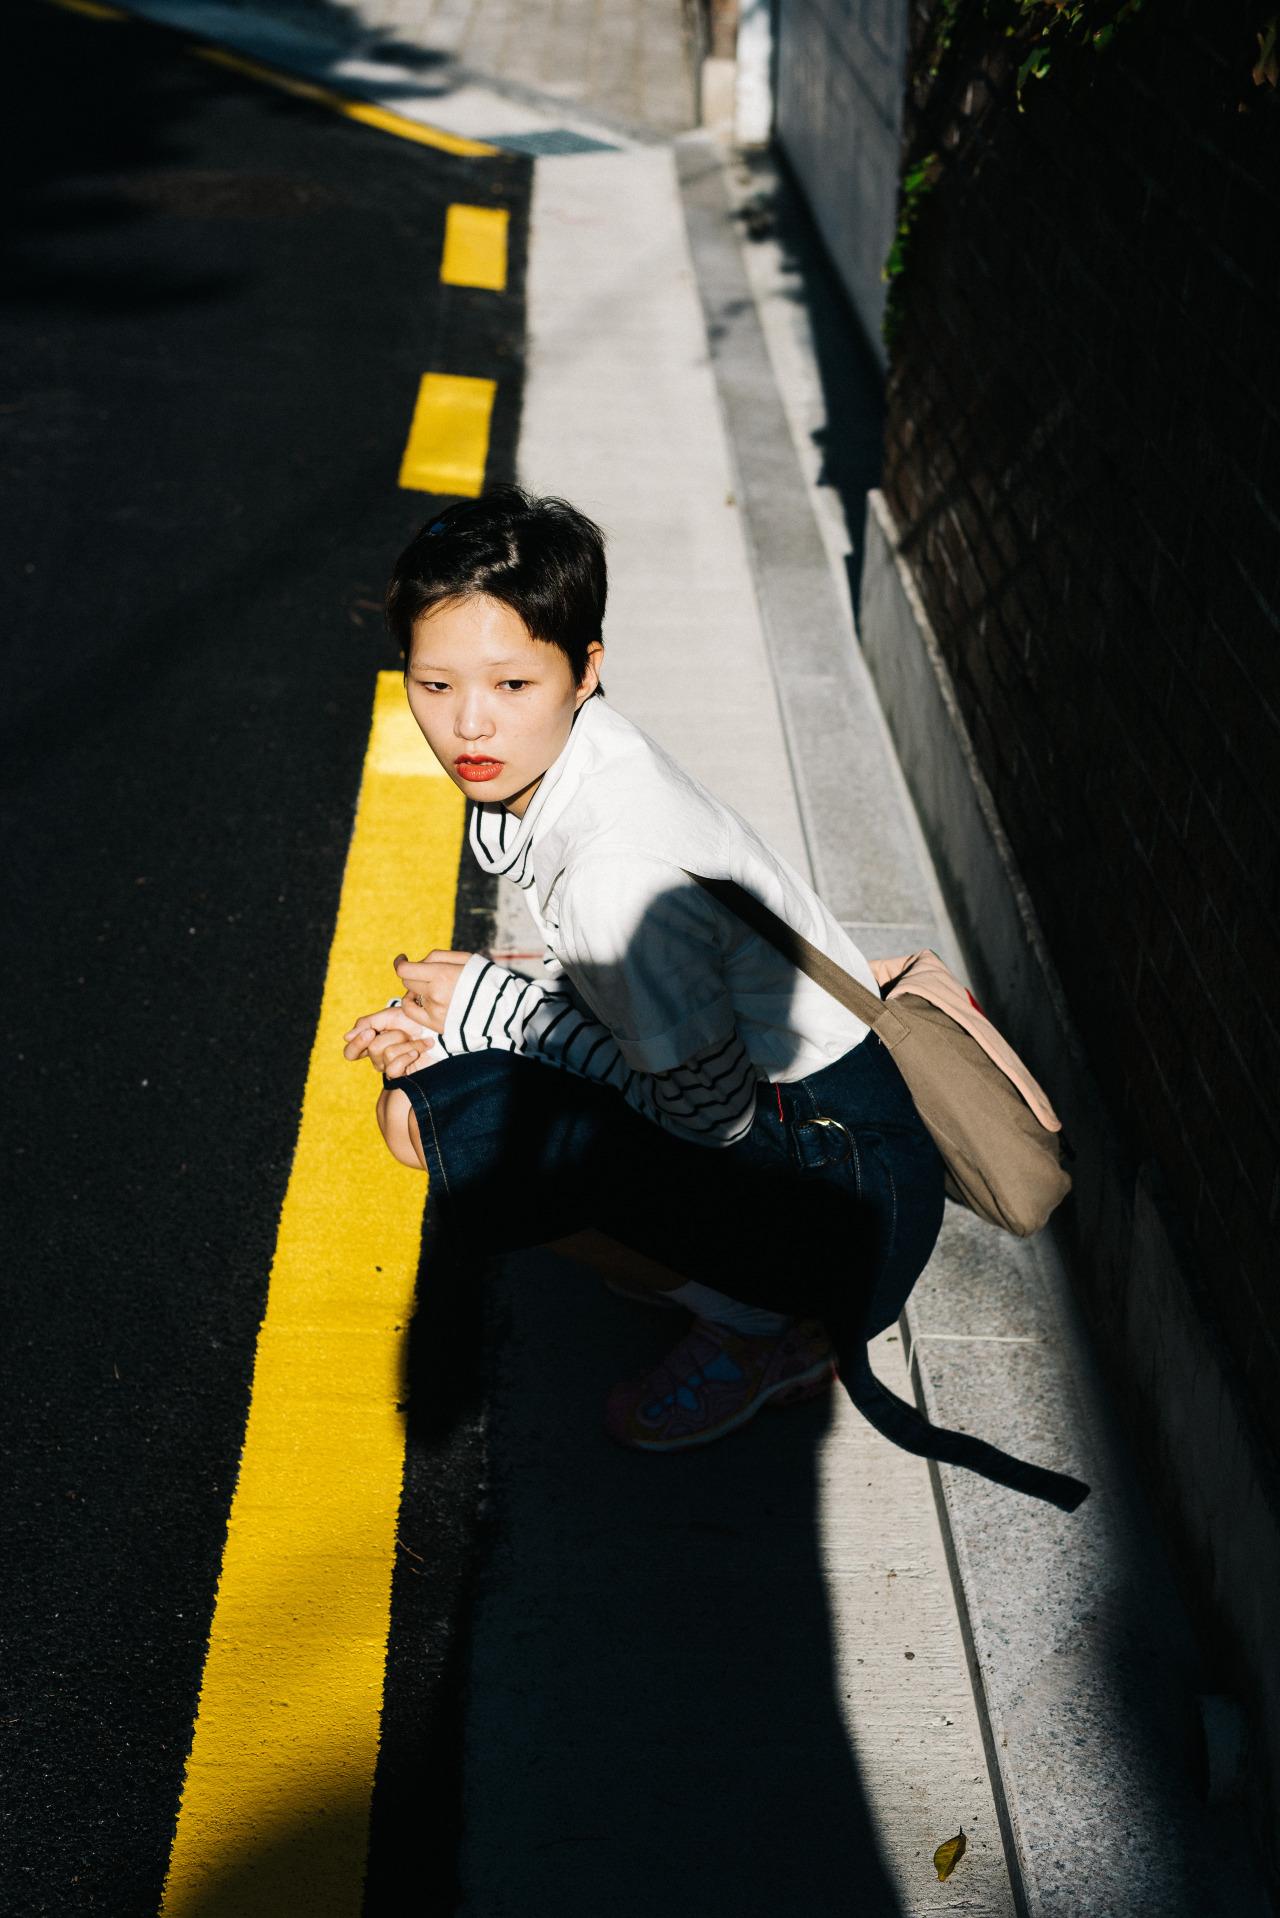 © I am Alex Finch, Seoul, South Korea